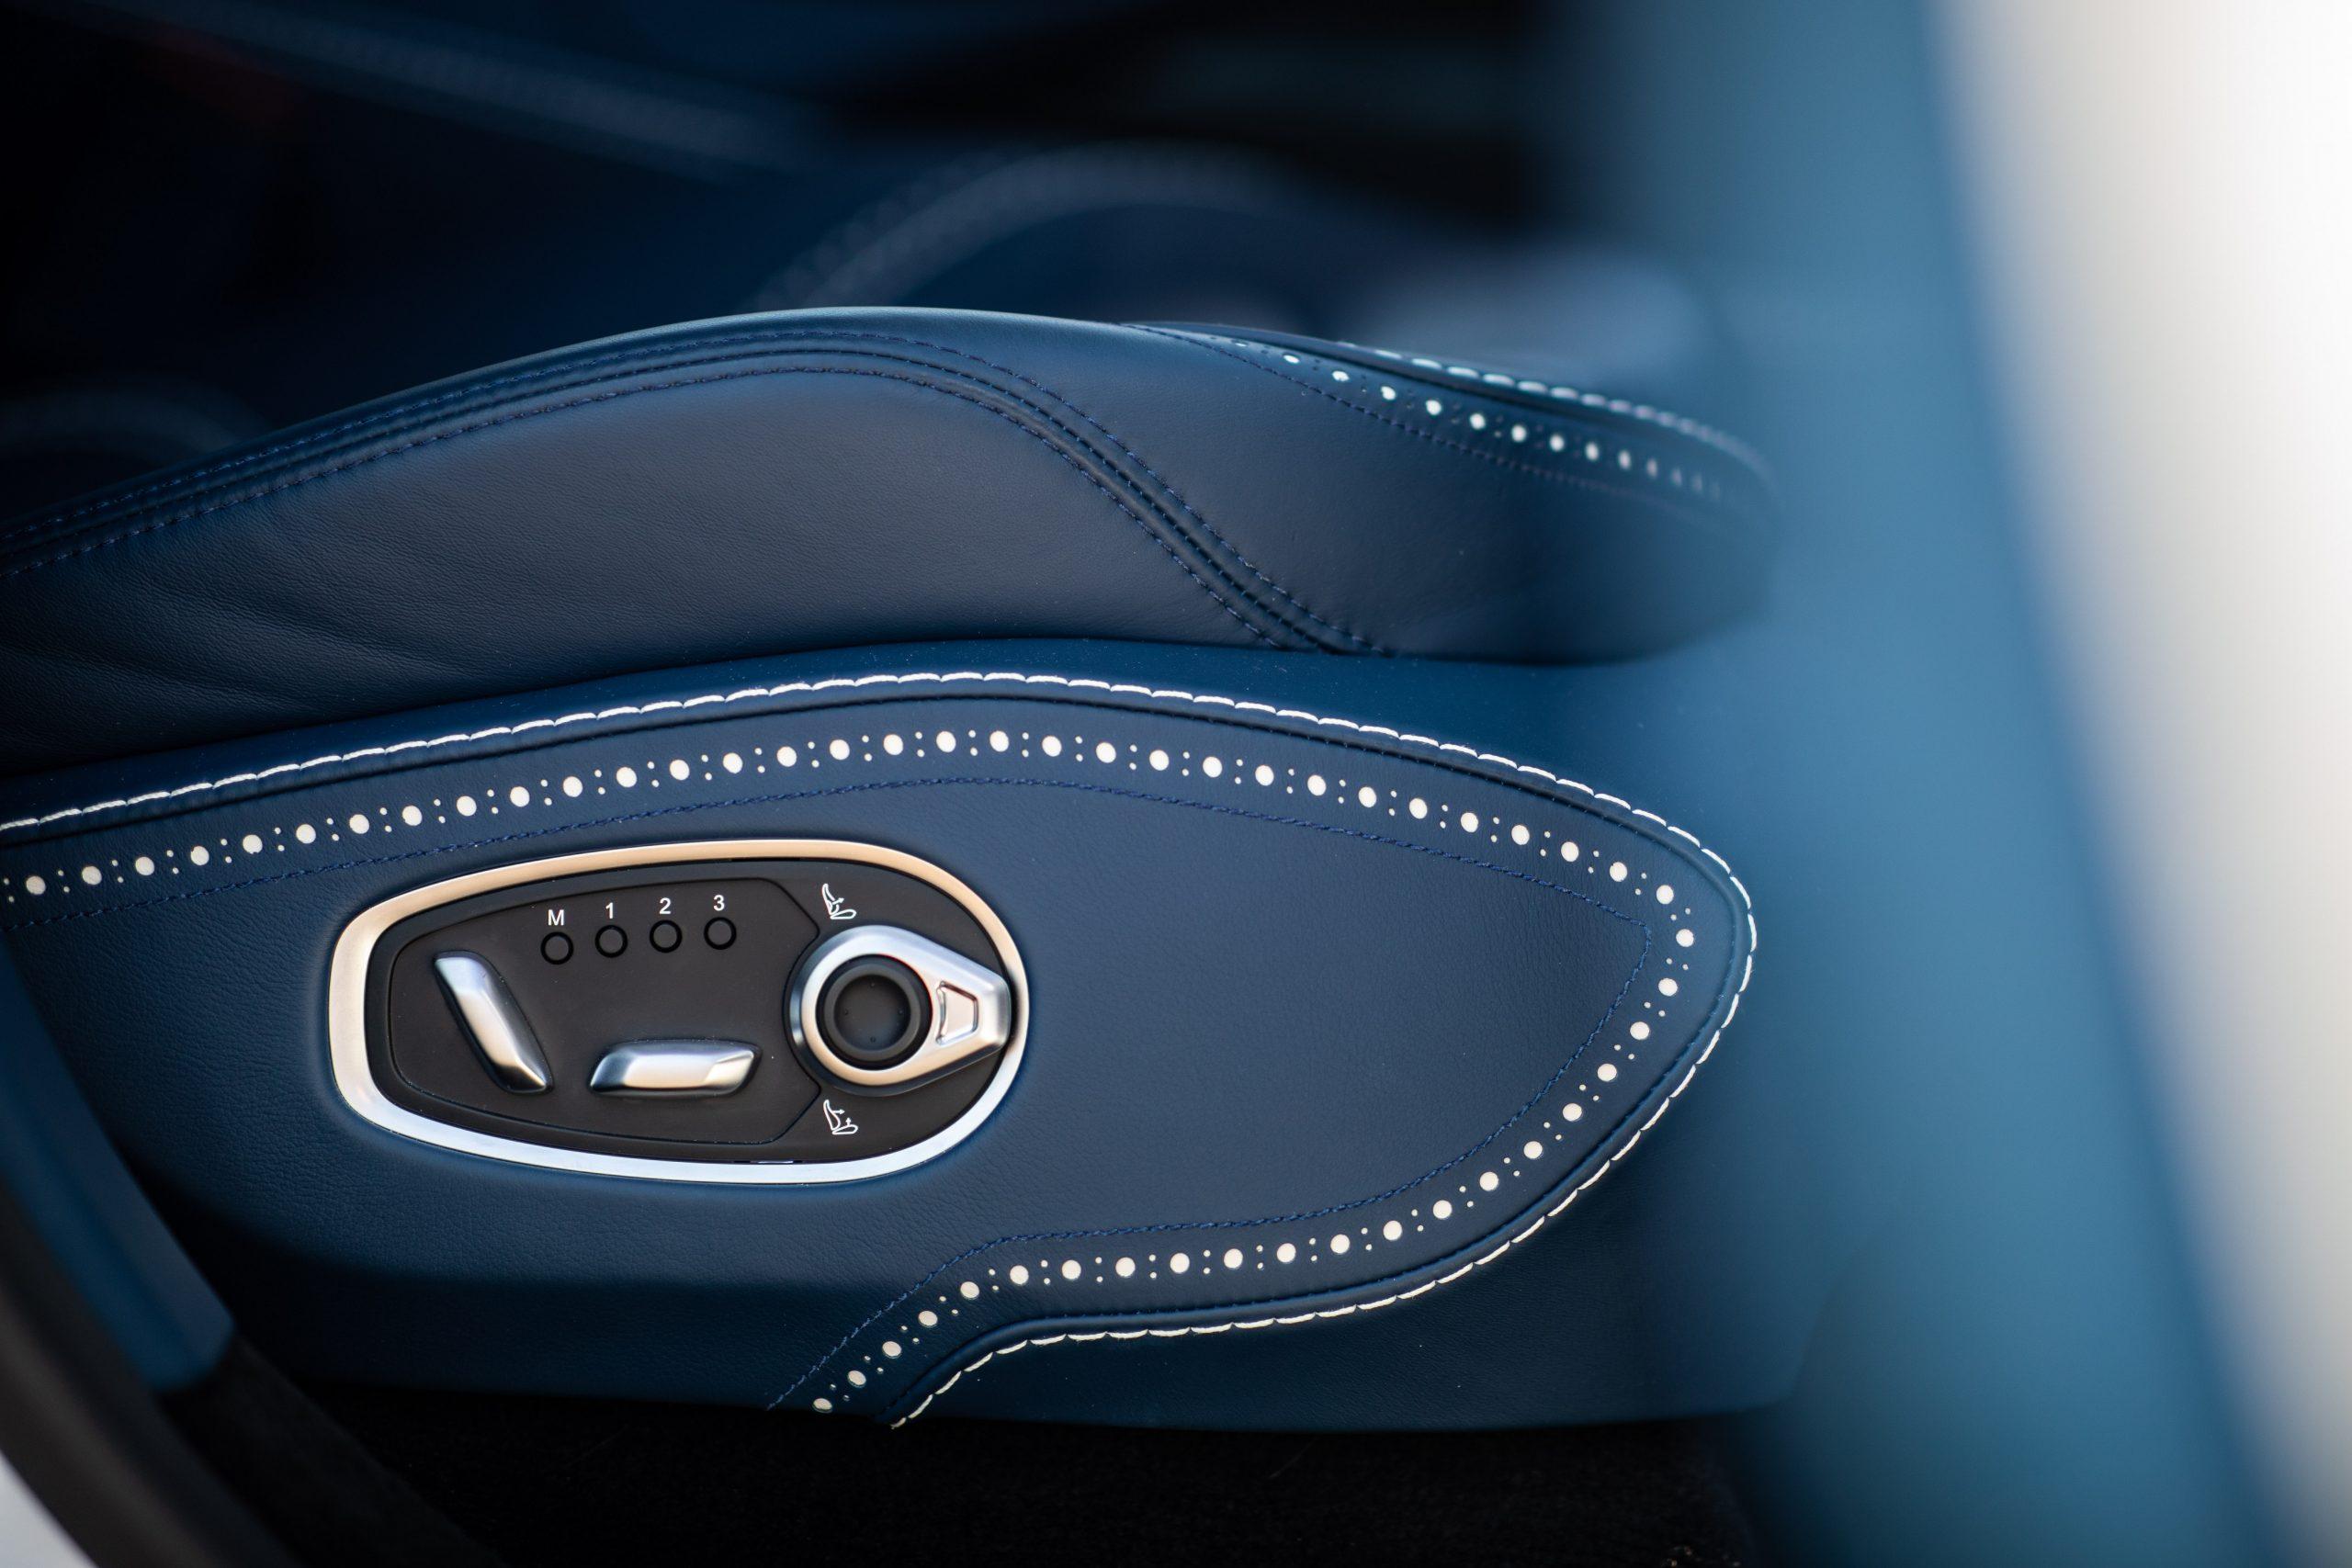 2021 Aston Martin DBX interior seat modes